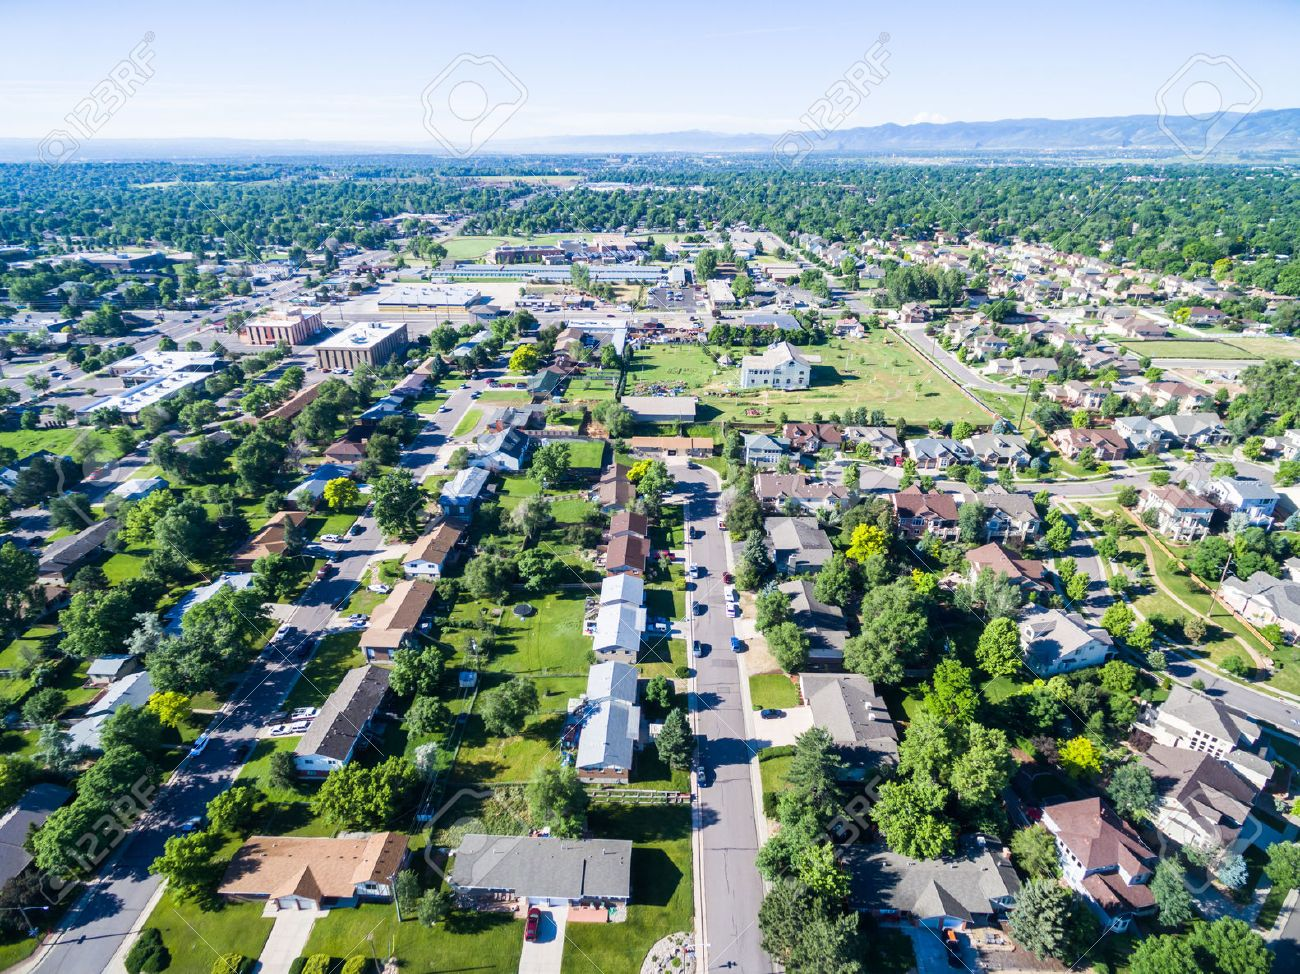 Aerial view of residential neighborhood in Lakewood, Colorado. Stock Photo - 42019829